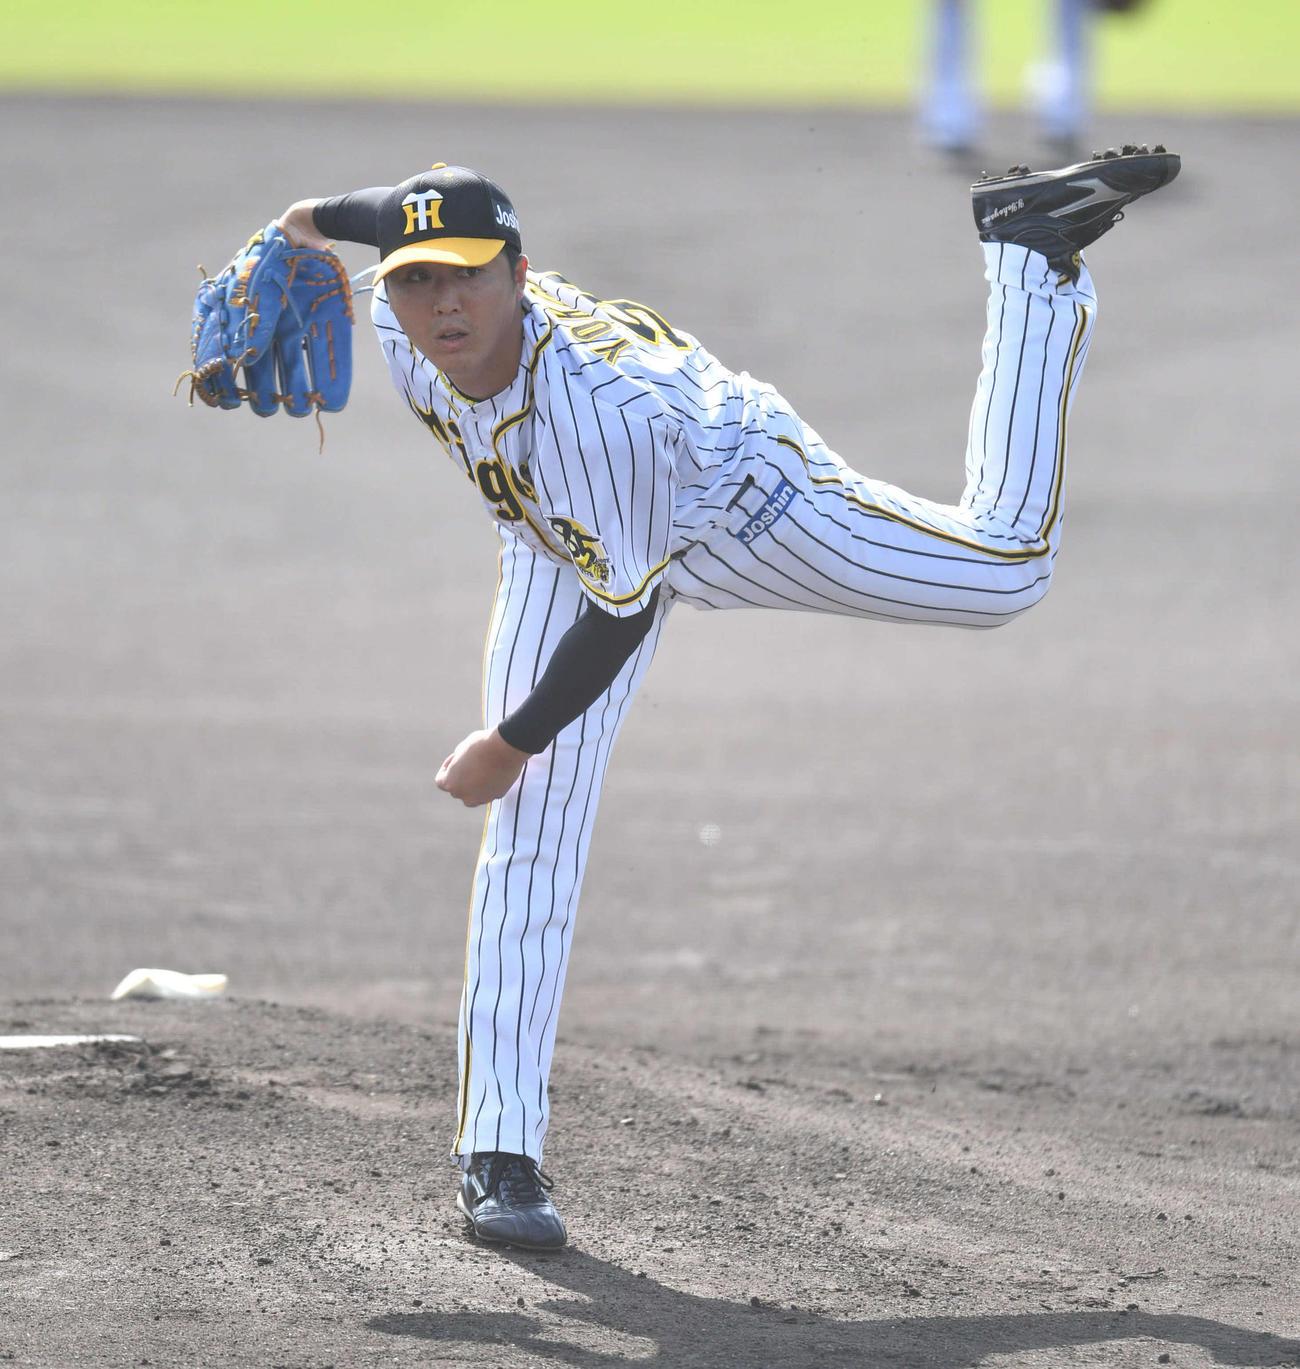 部 人事 プロ 野球